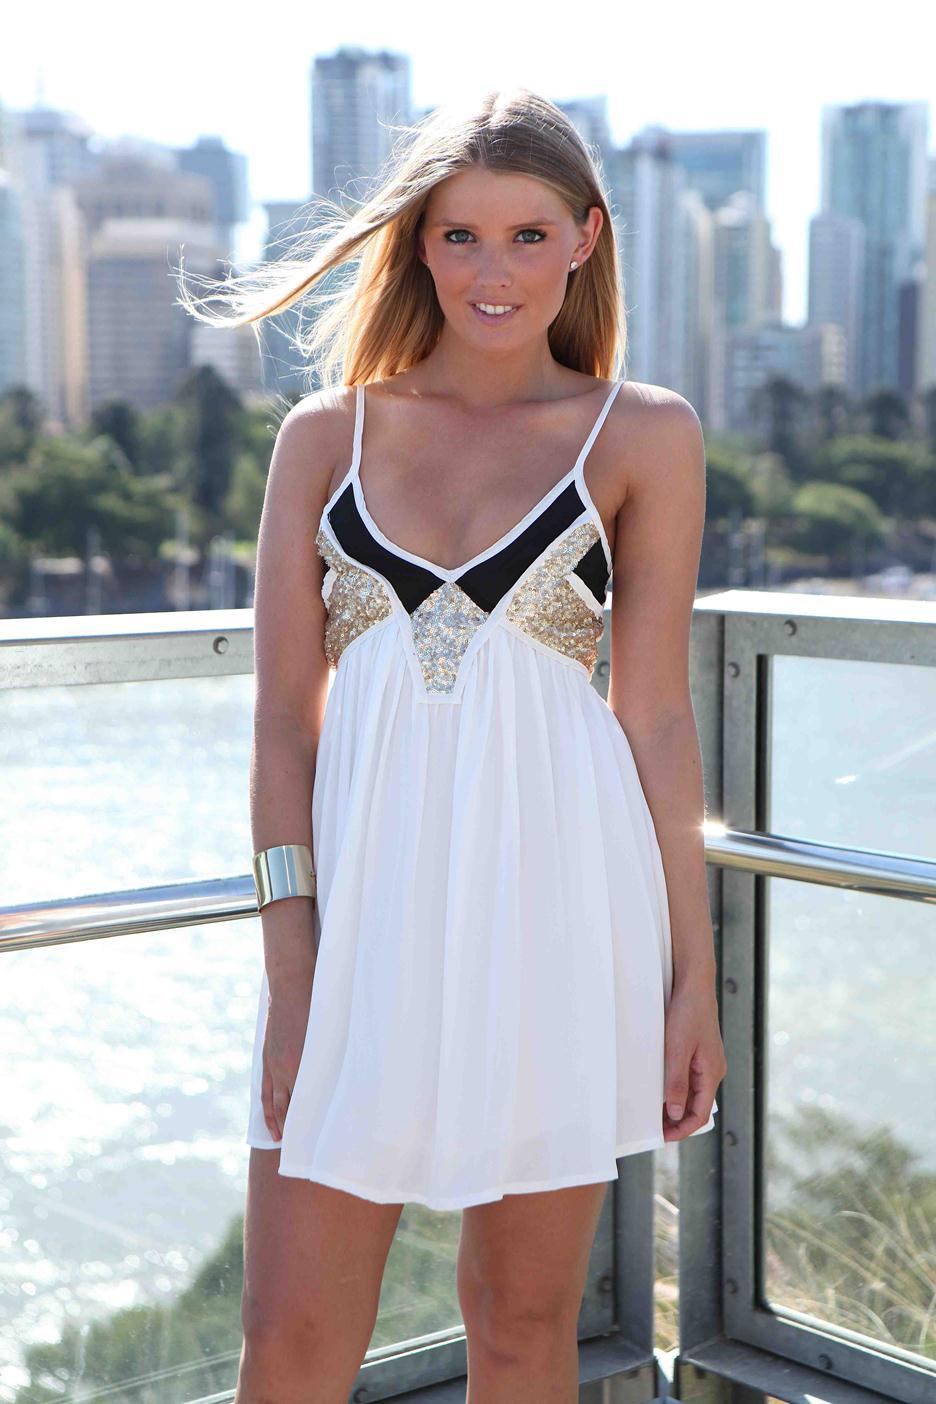 White Sequin Dress - White & Black Sequin Embellished   UsTrendy